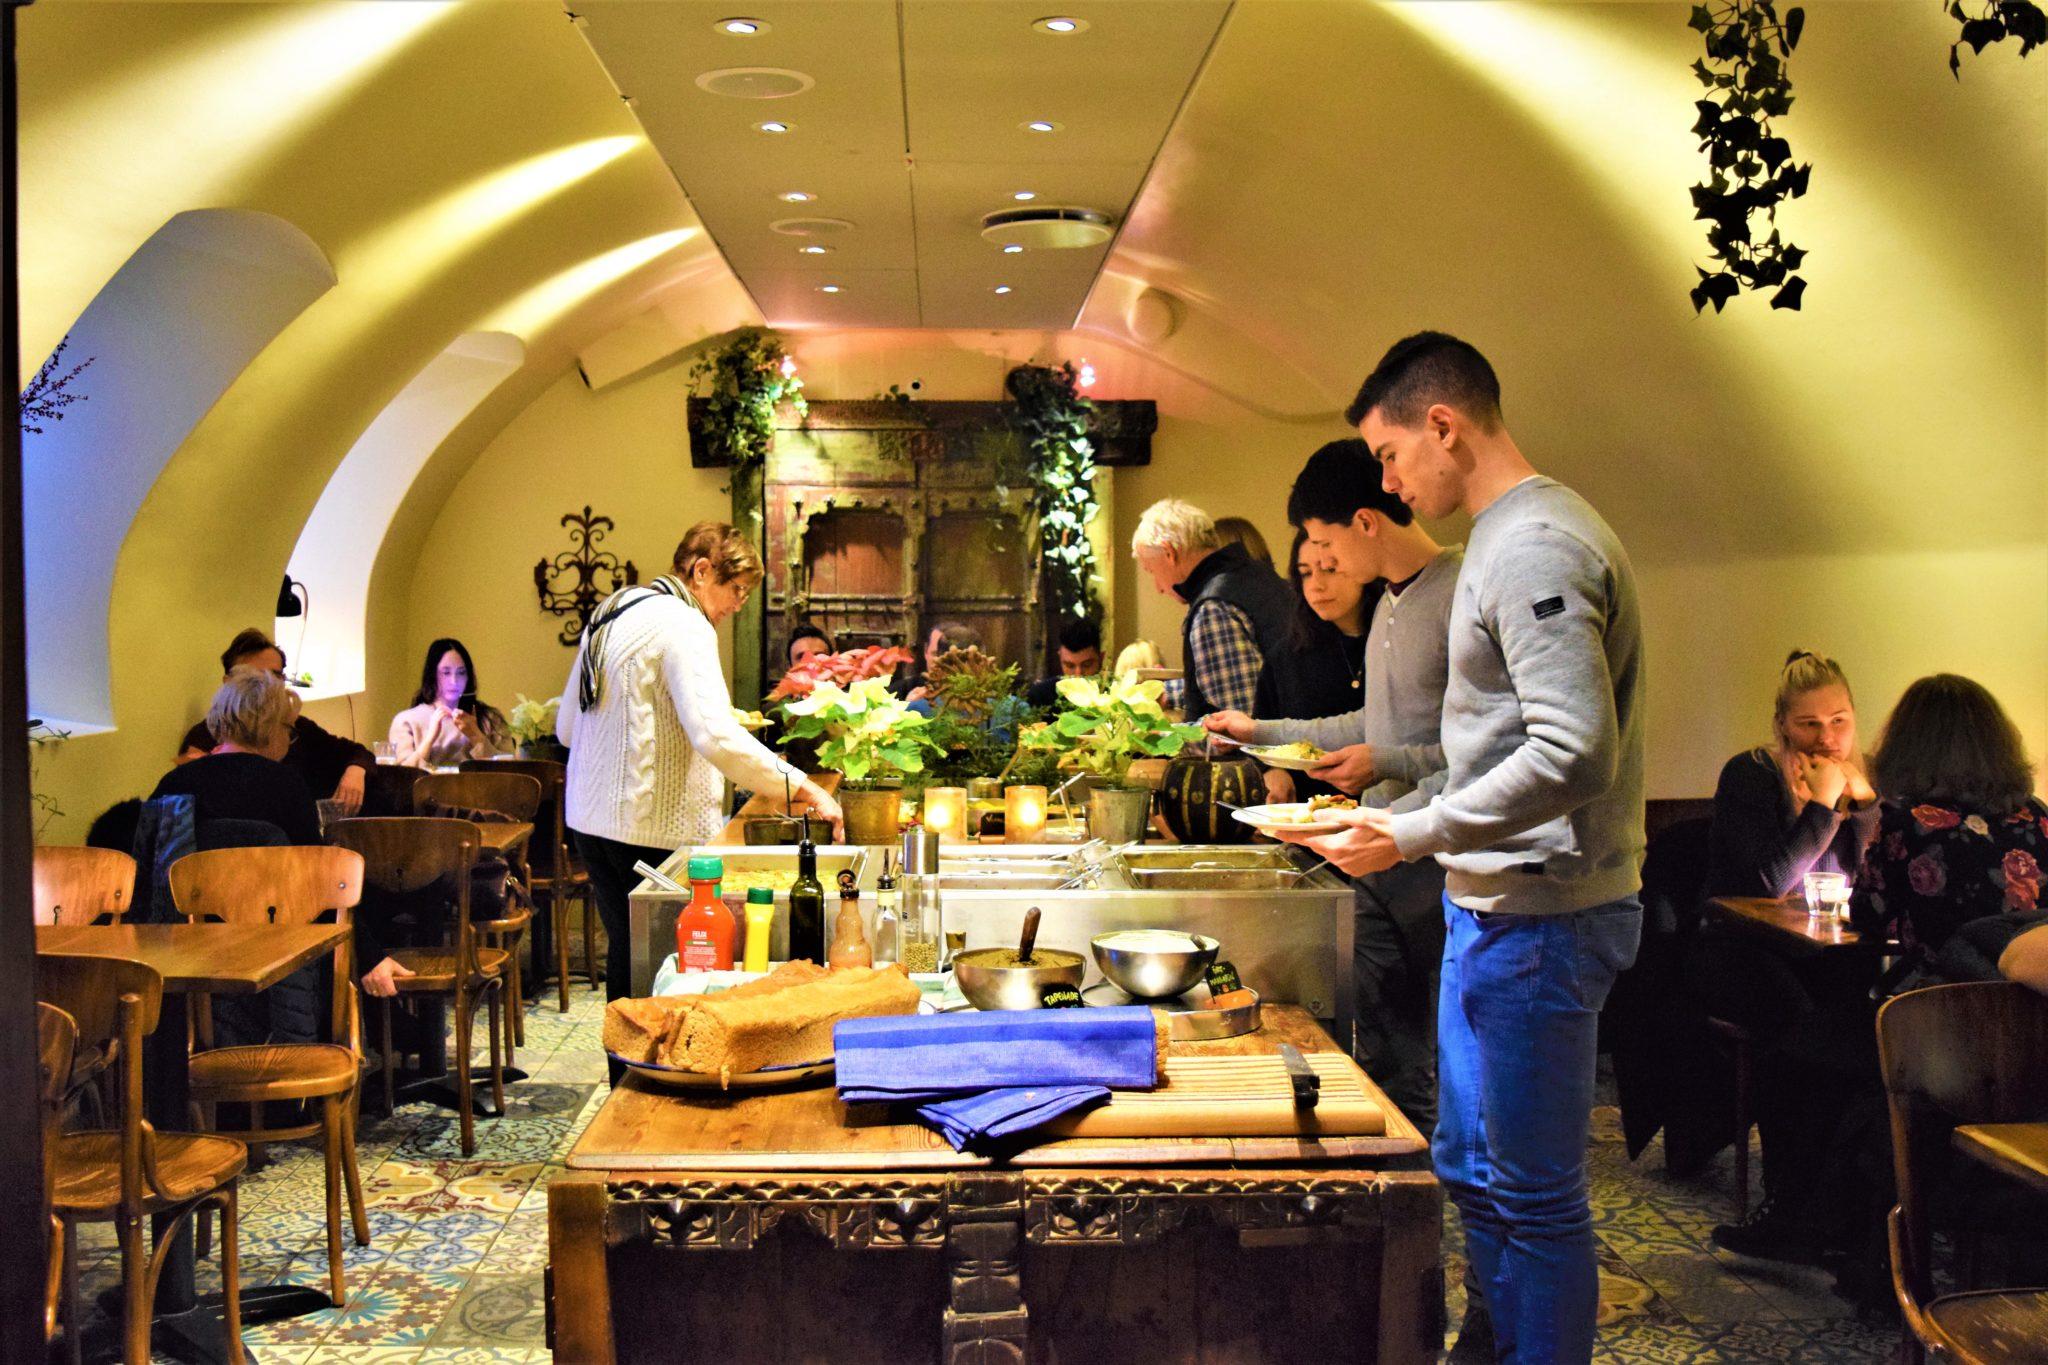 Hermans vegan buffet, stockhom, sweden